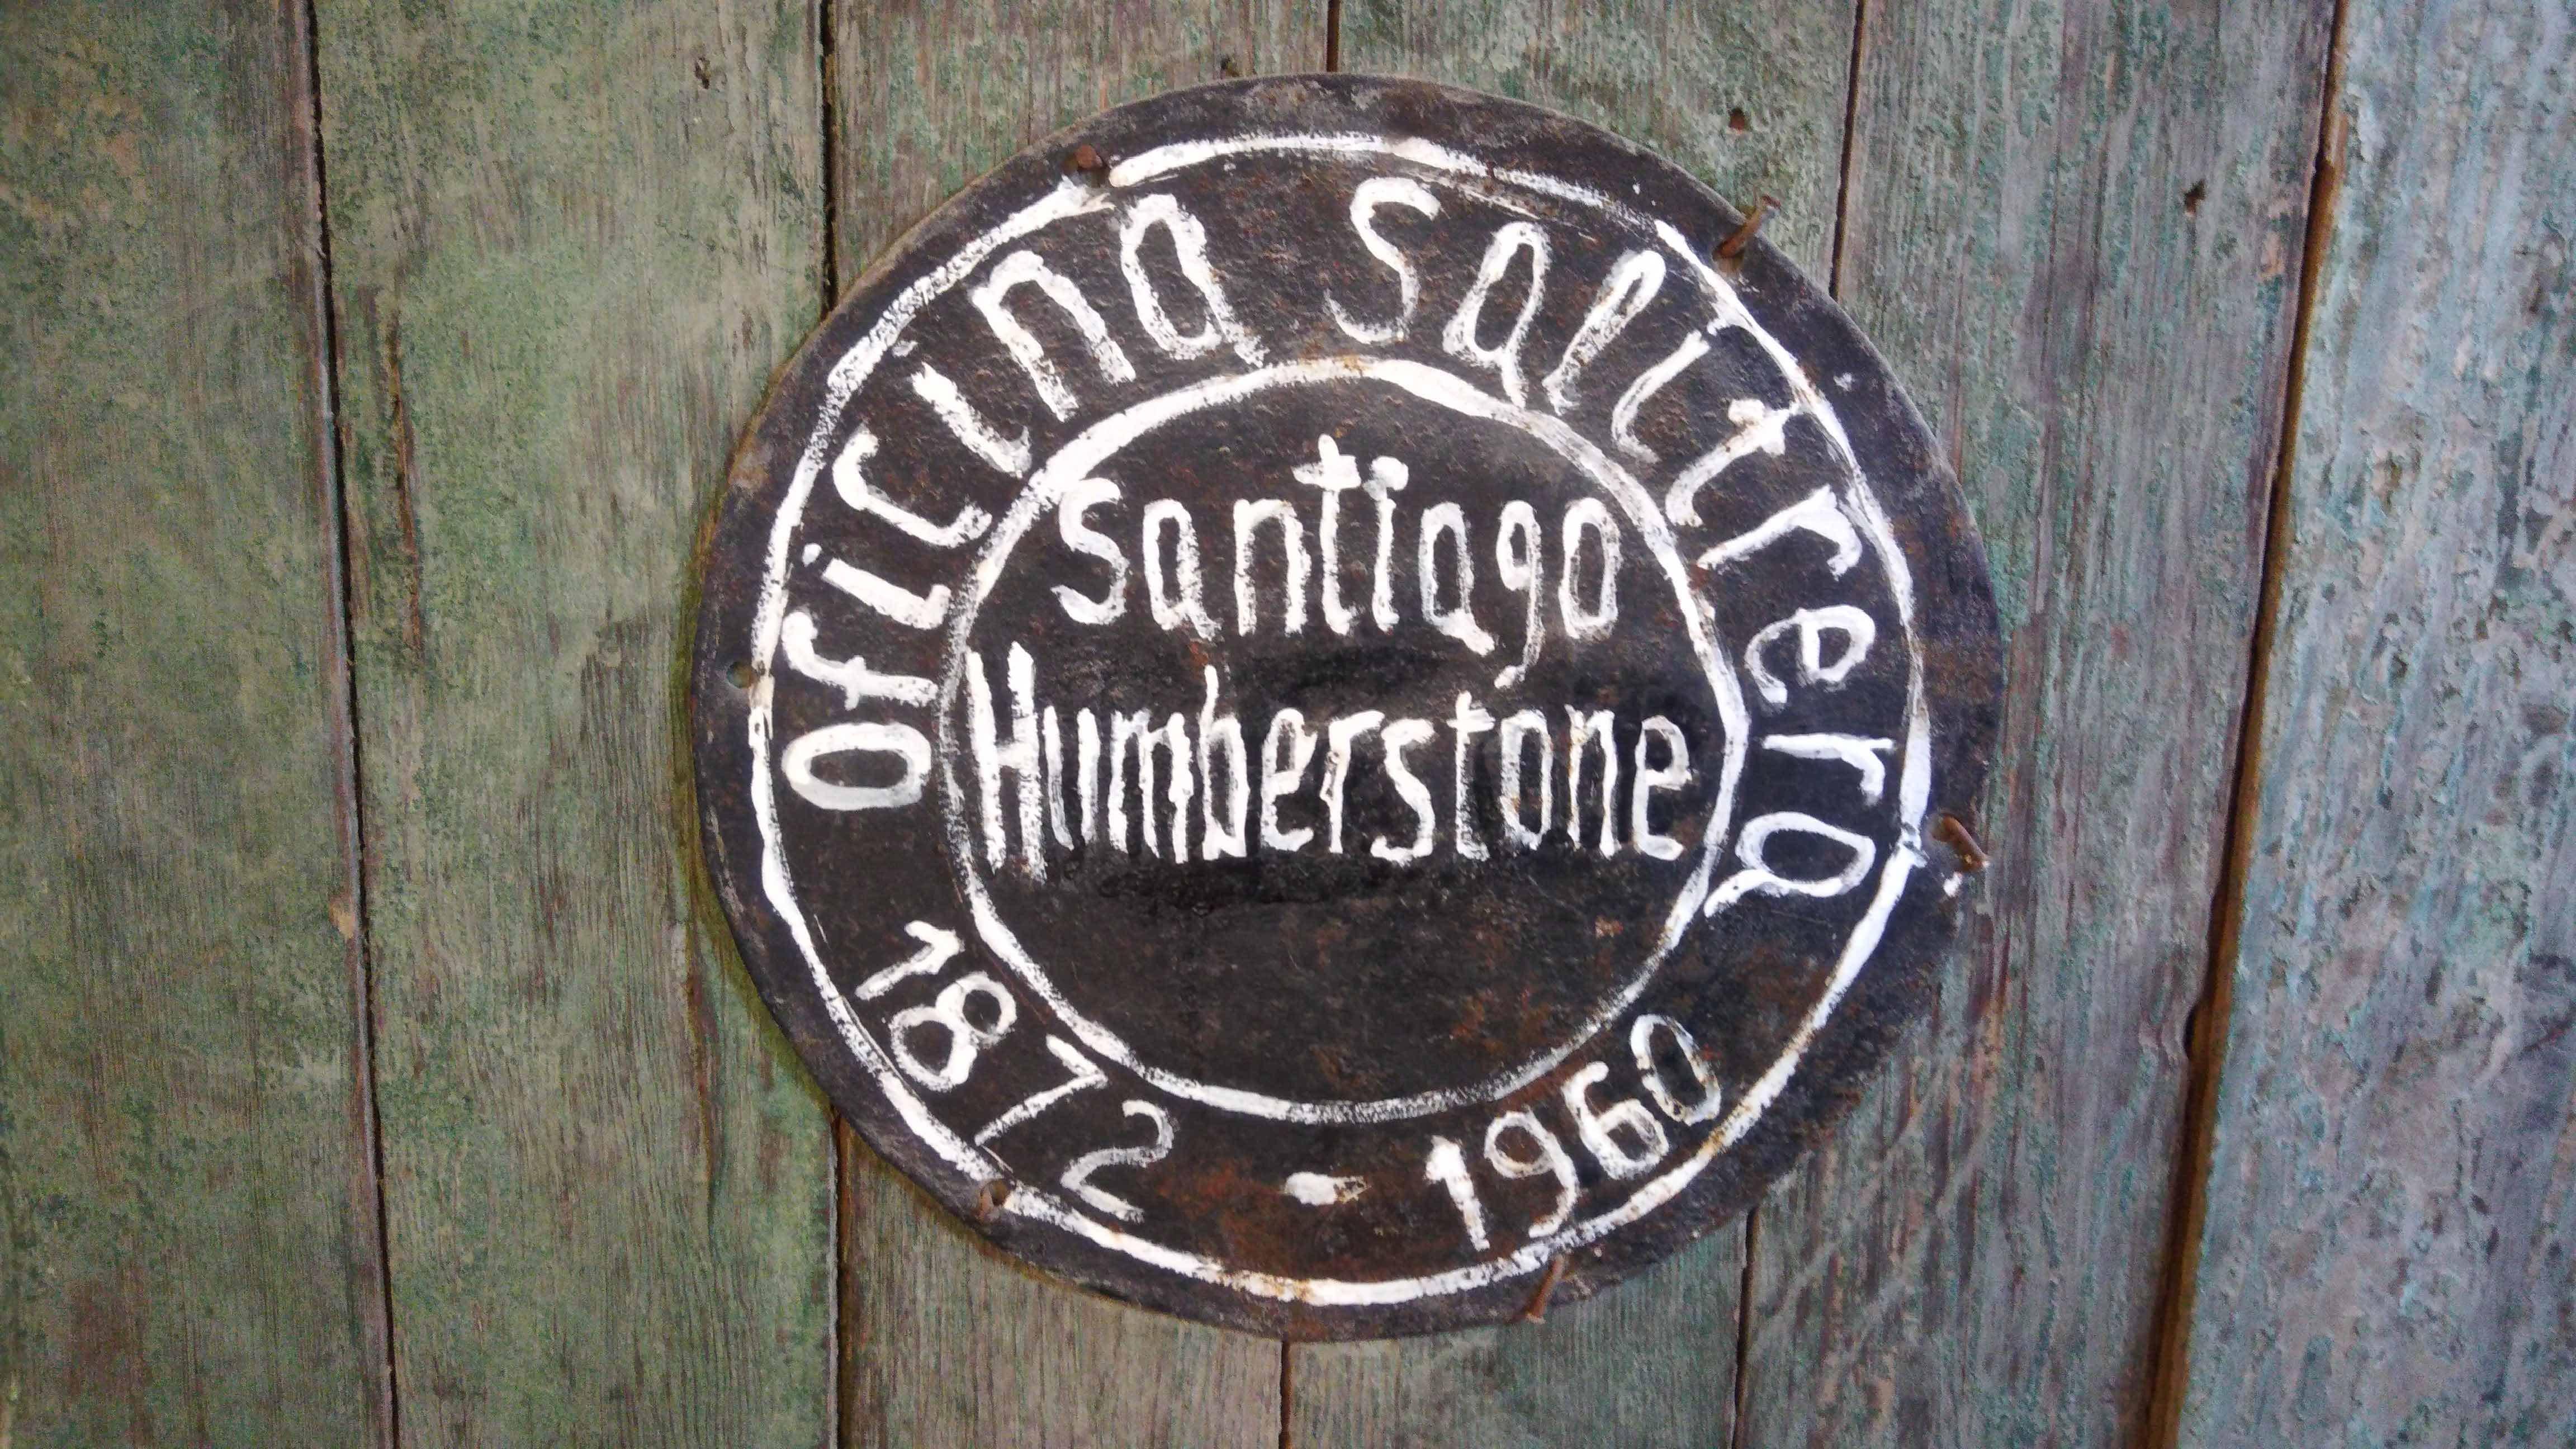 008 0112 Humberstone 119jpeg